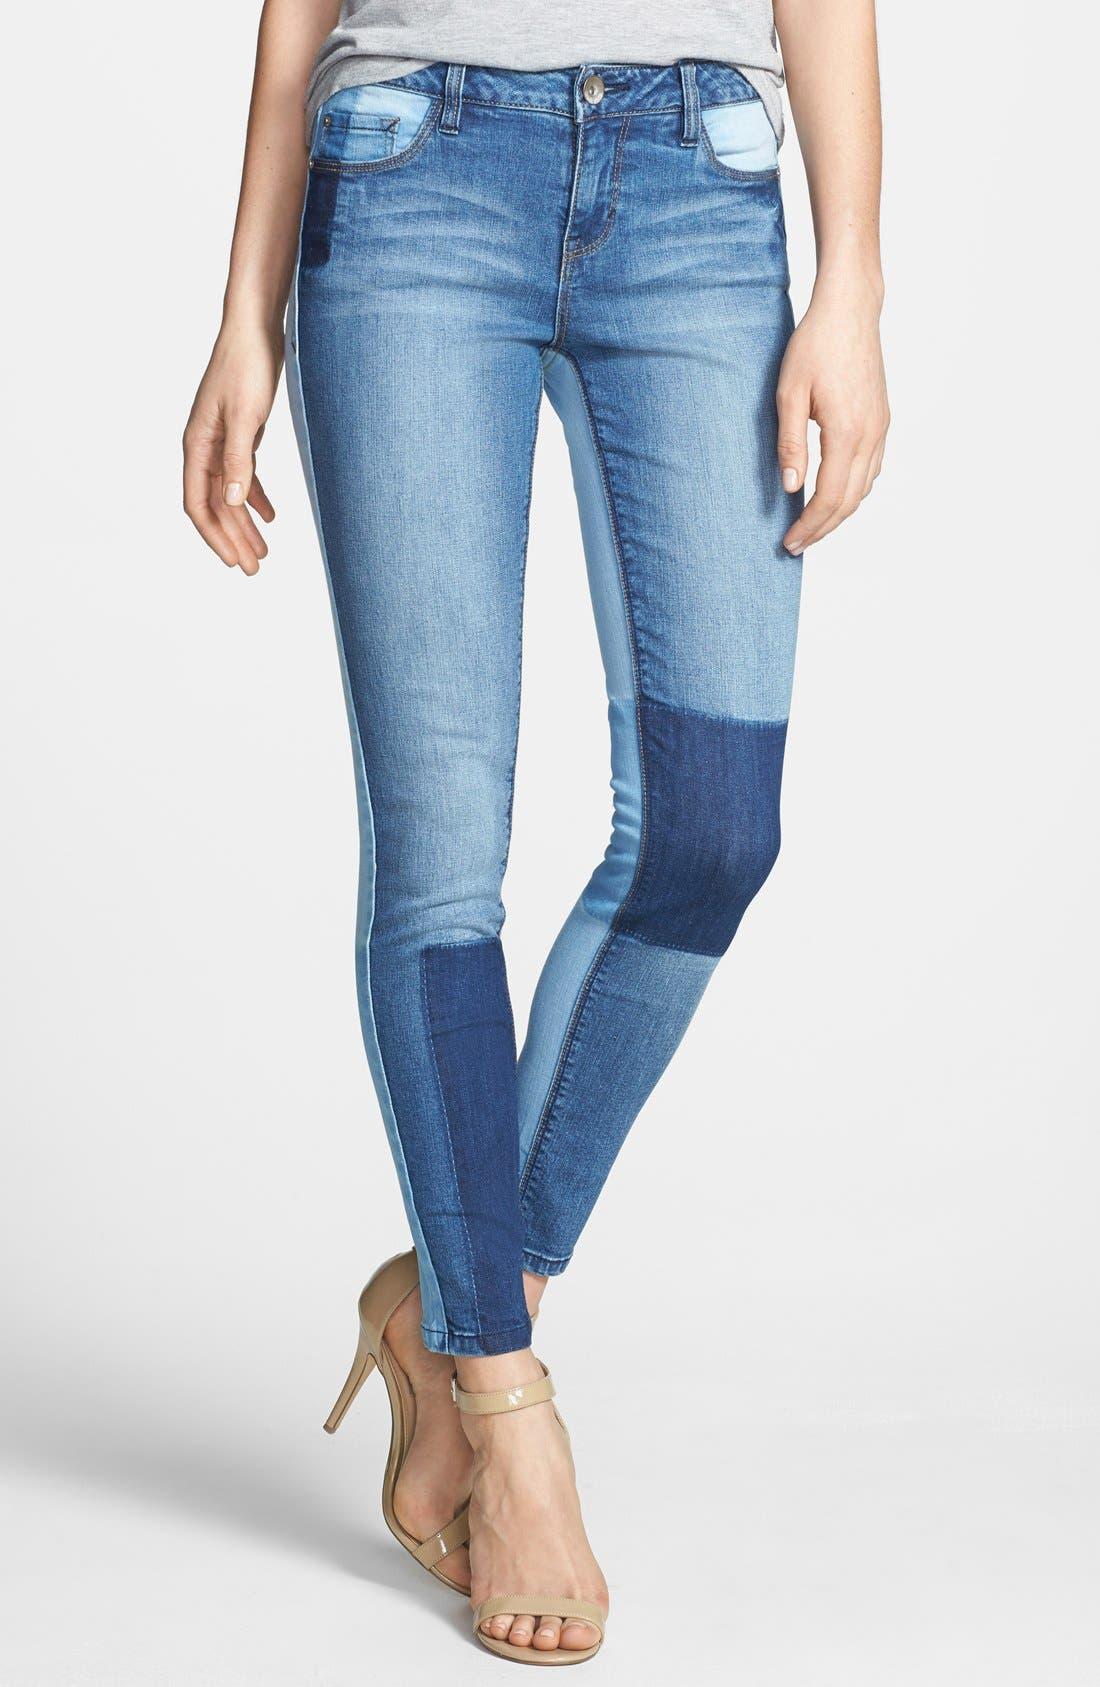 Main Image - kensie 'Ankle Biter' Colorblock Skinny Jeans (Vintage Twister)